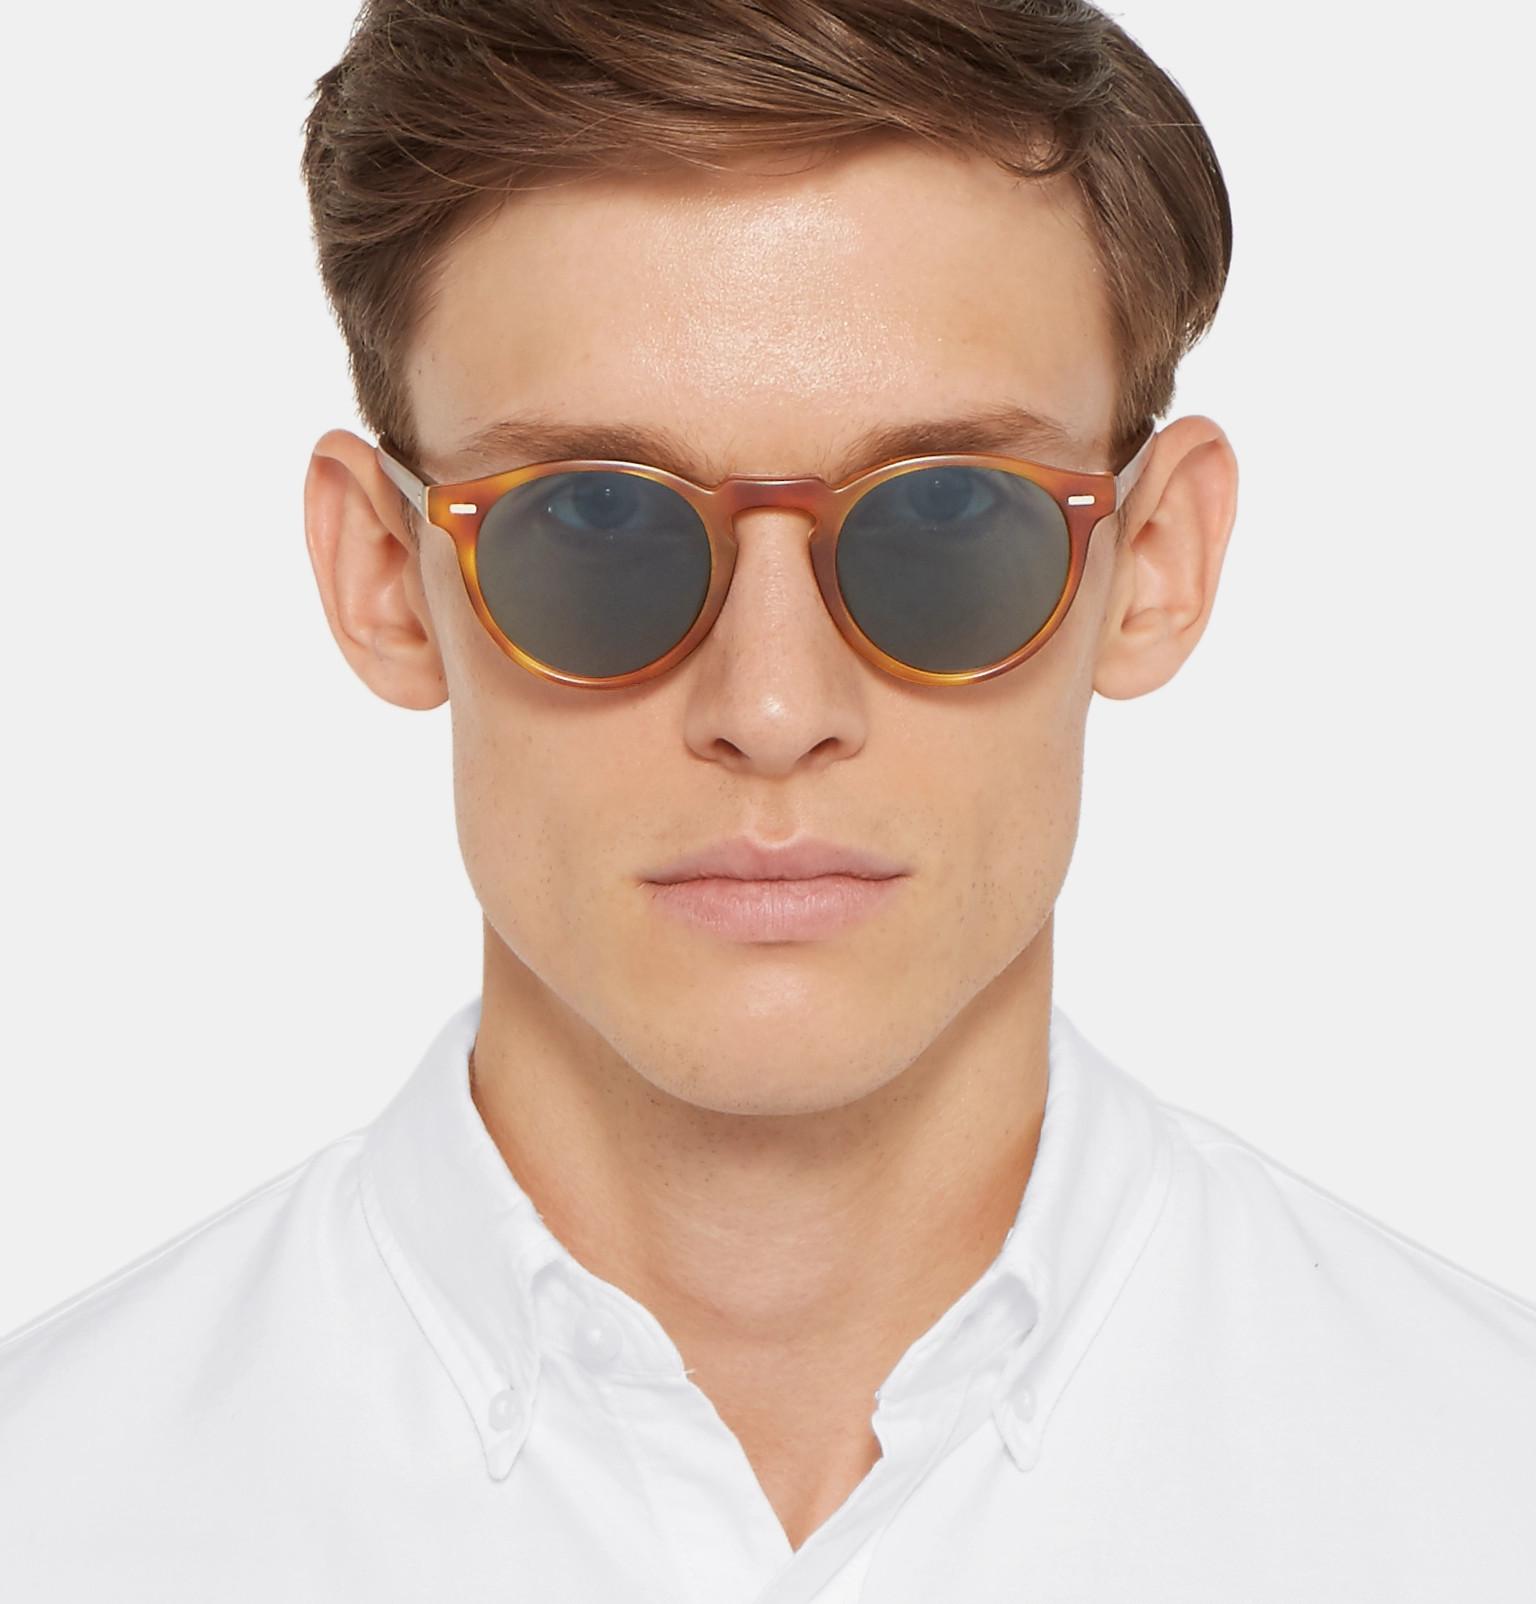 387d6828a0d Oliver PeoplesGregory Peck Round-Frame Tortoiseshell Acetate Photochromic  Sunglasses